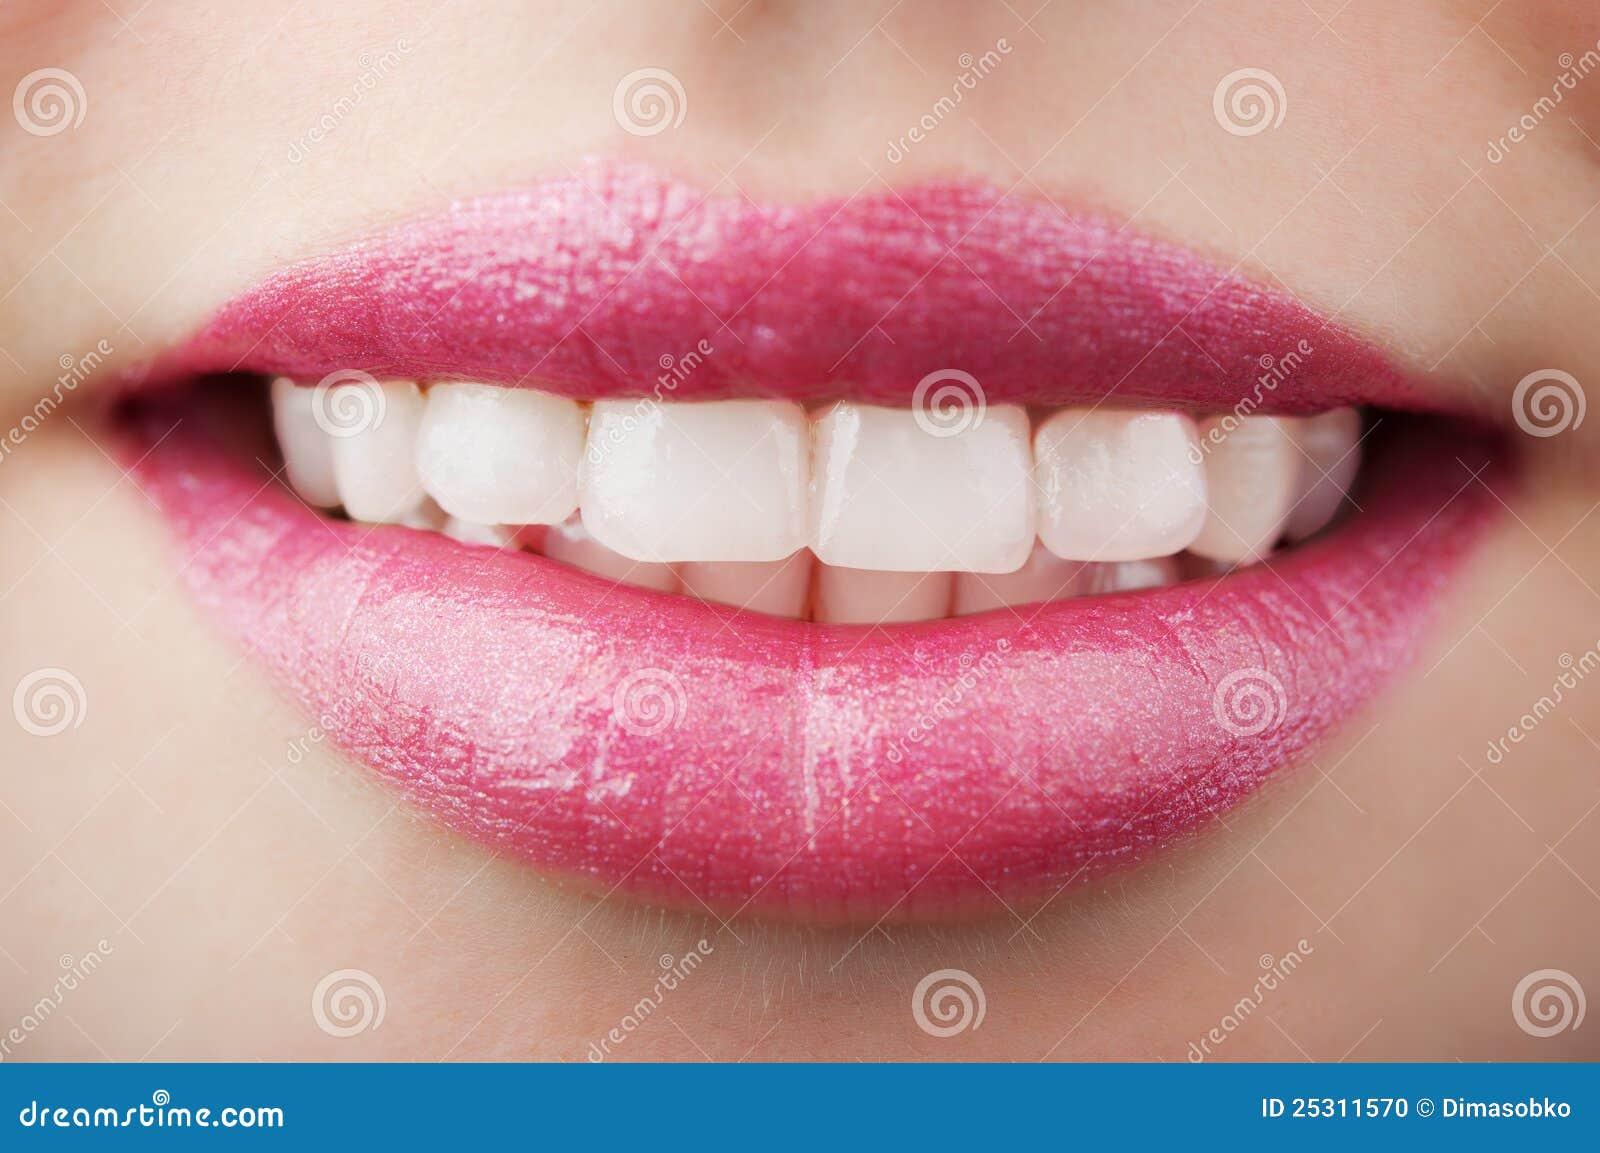 Photos Of Mouth 56